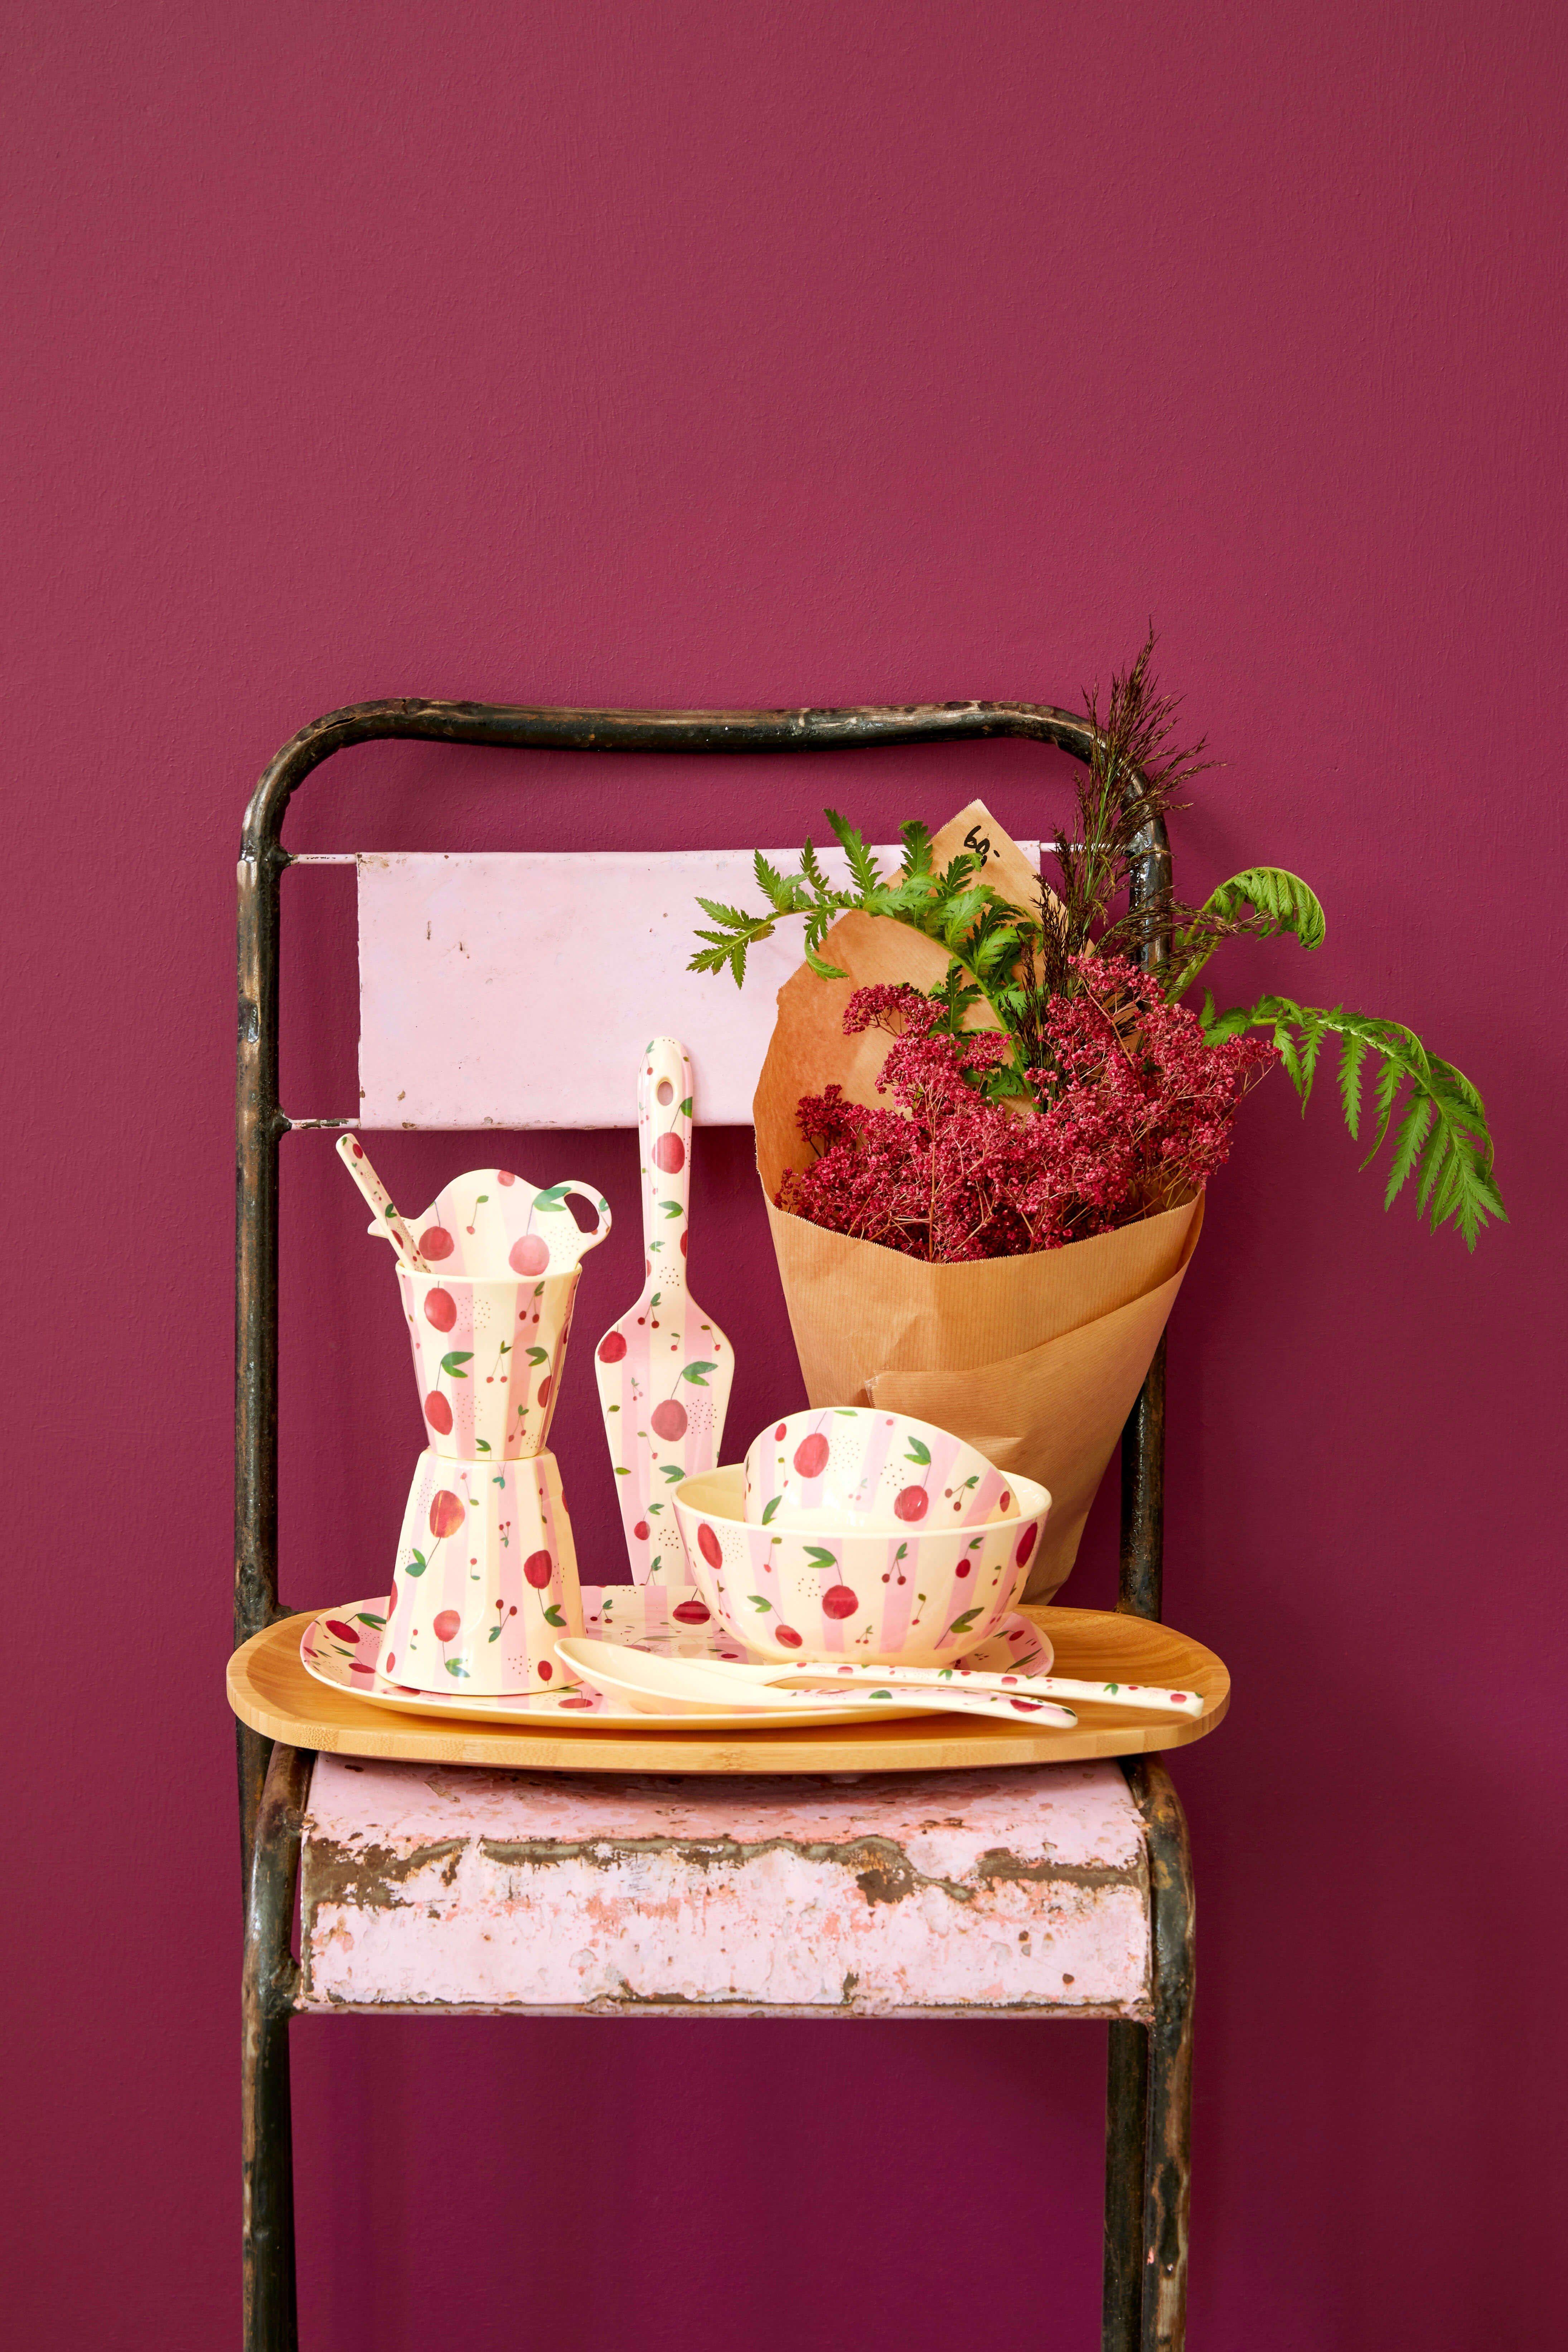 Löffel lang - Melamine Latte Spoon - Cherry Print - rice